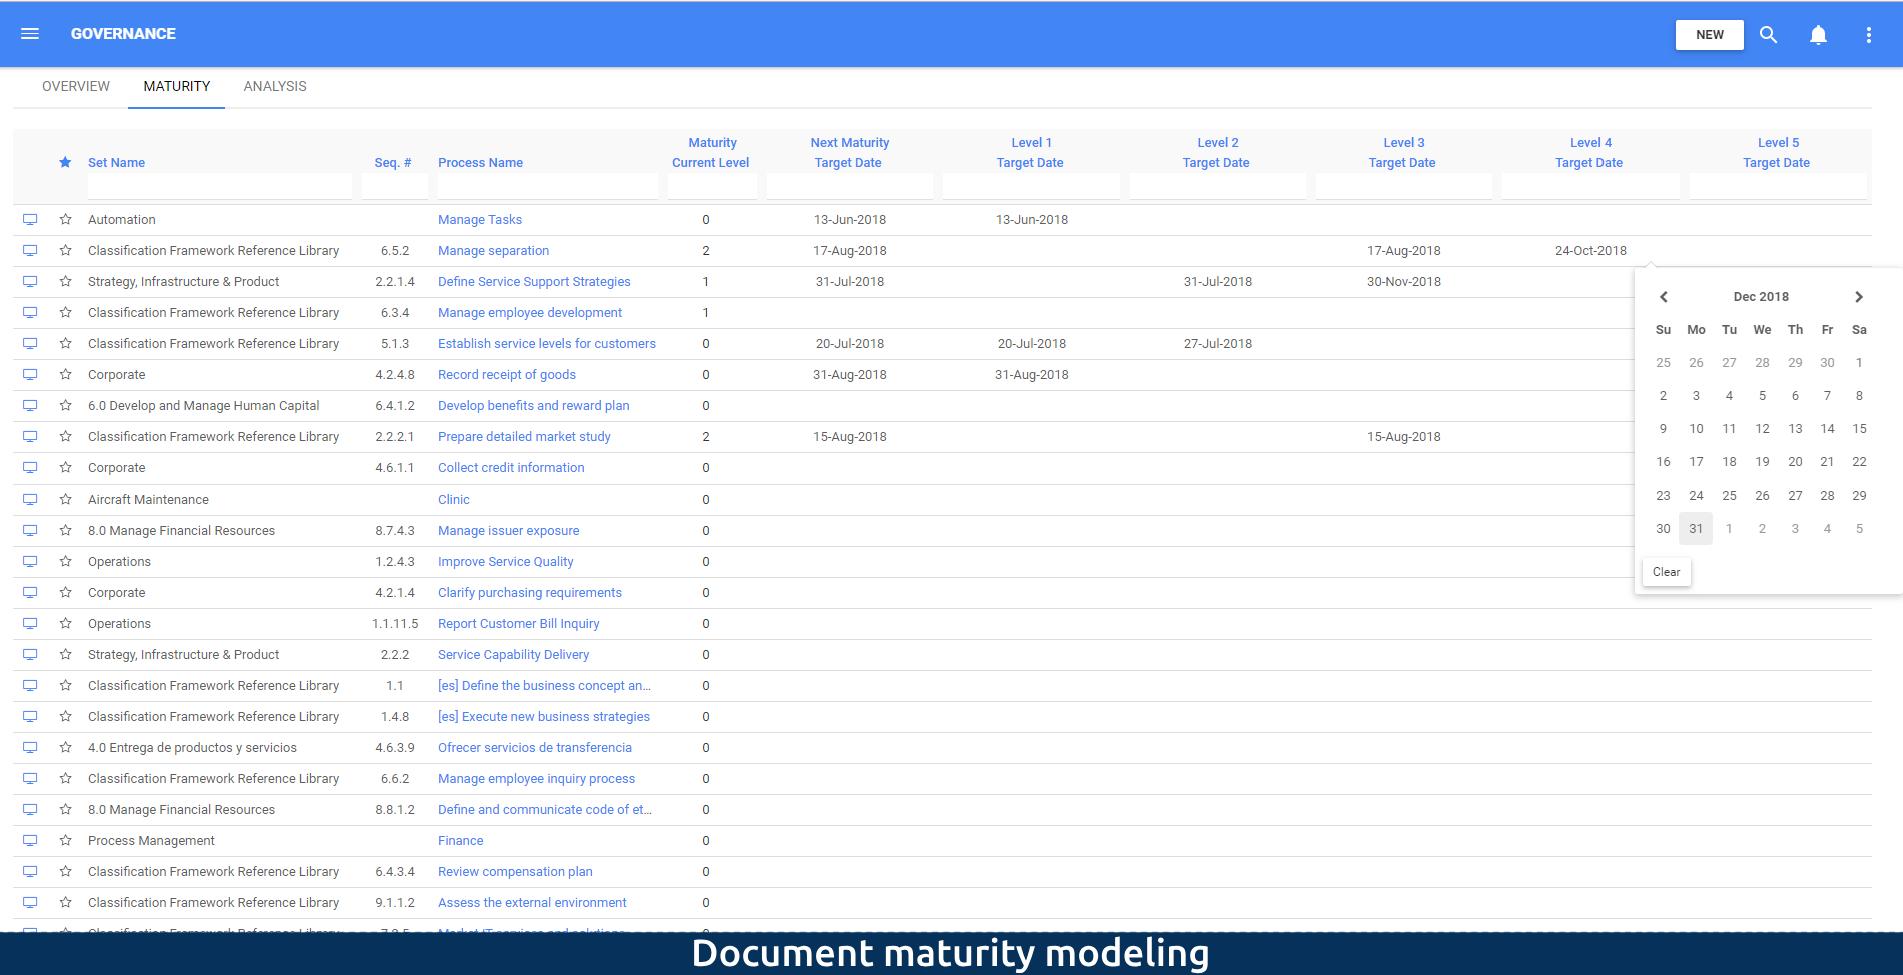 Document maturity modeling